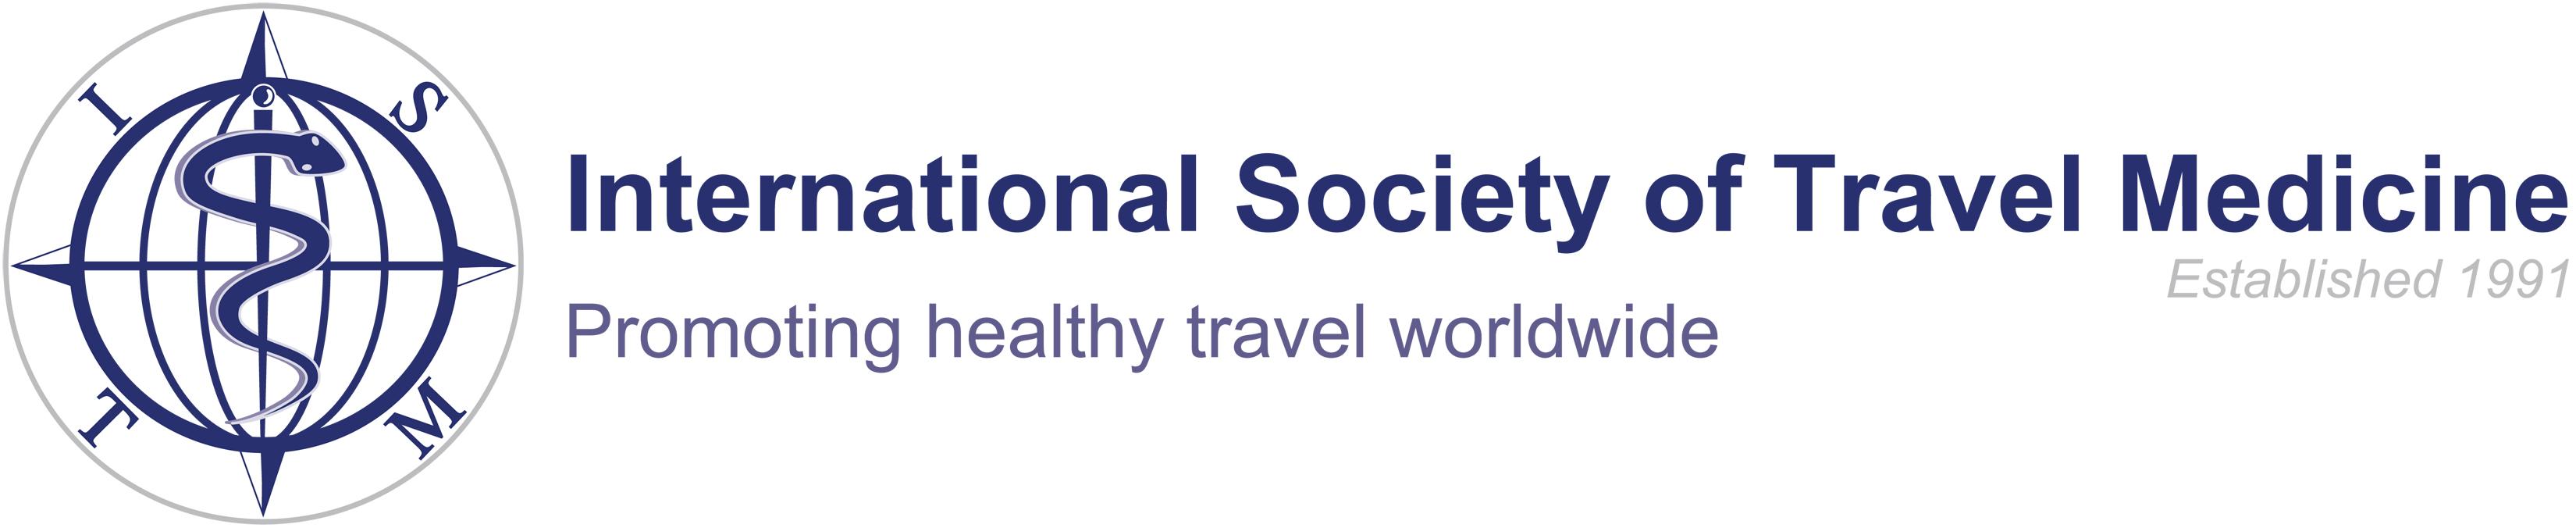 logo for International Society of Travel Medicine